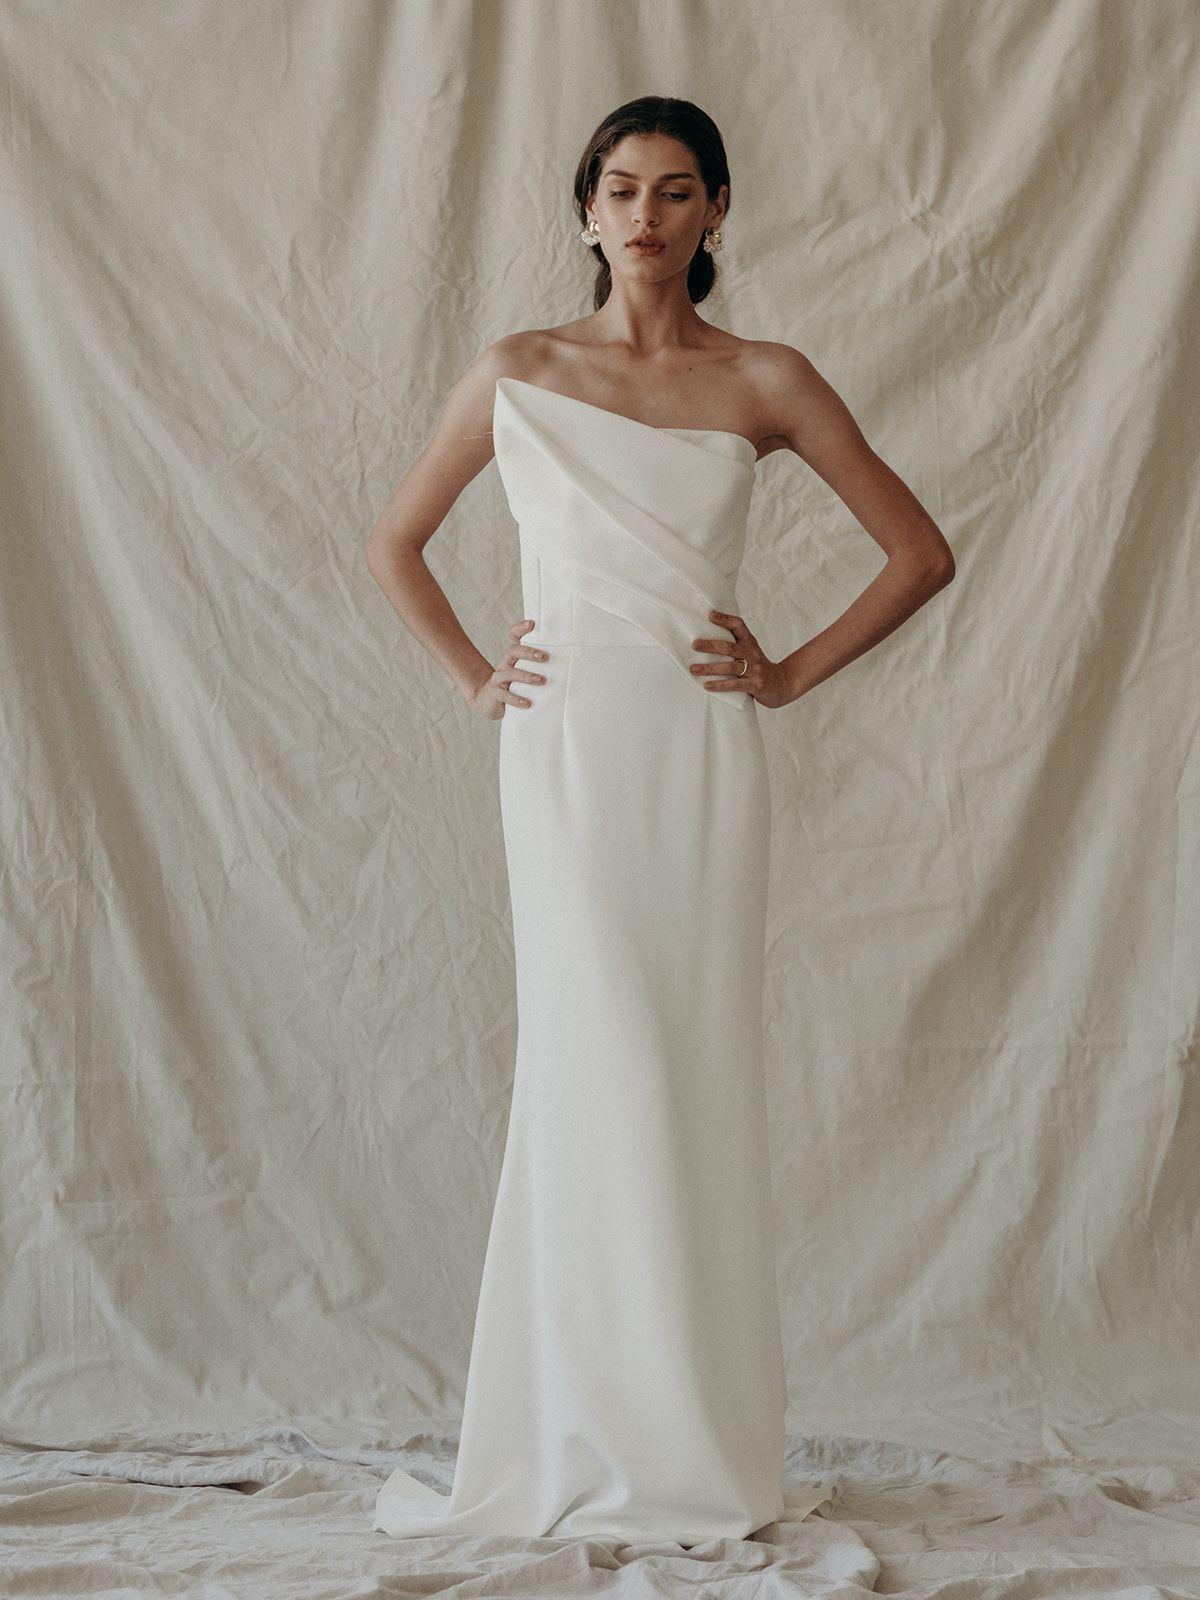 L L Dress Options Newhite Dresses Skirt And Top Dress Beautiful Gowns [ 1600 x 1200 Pixel ]